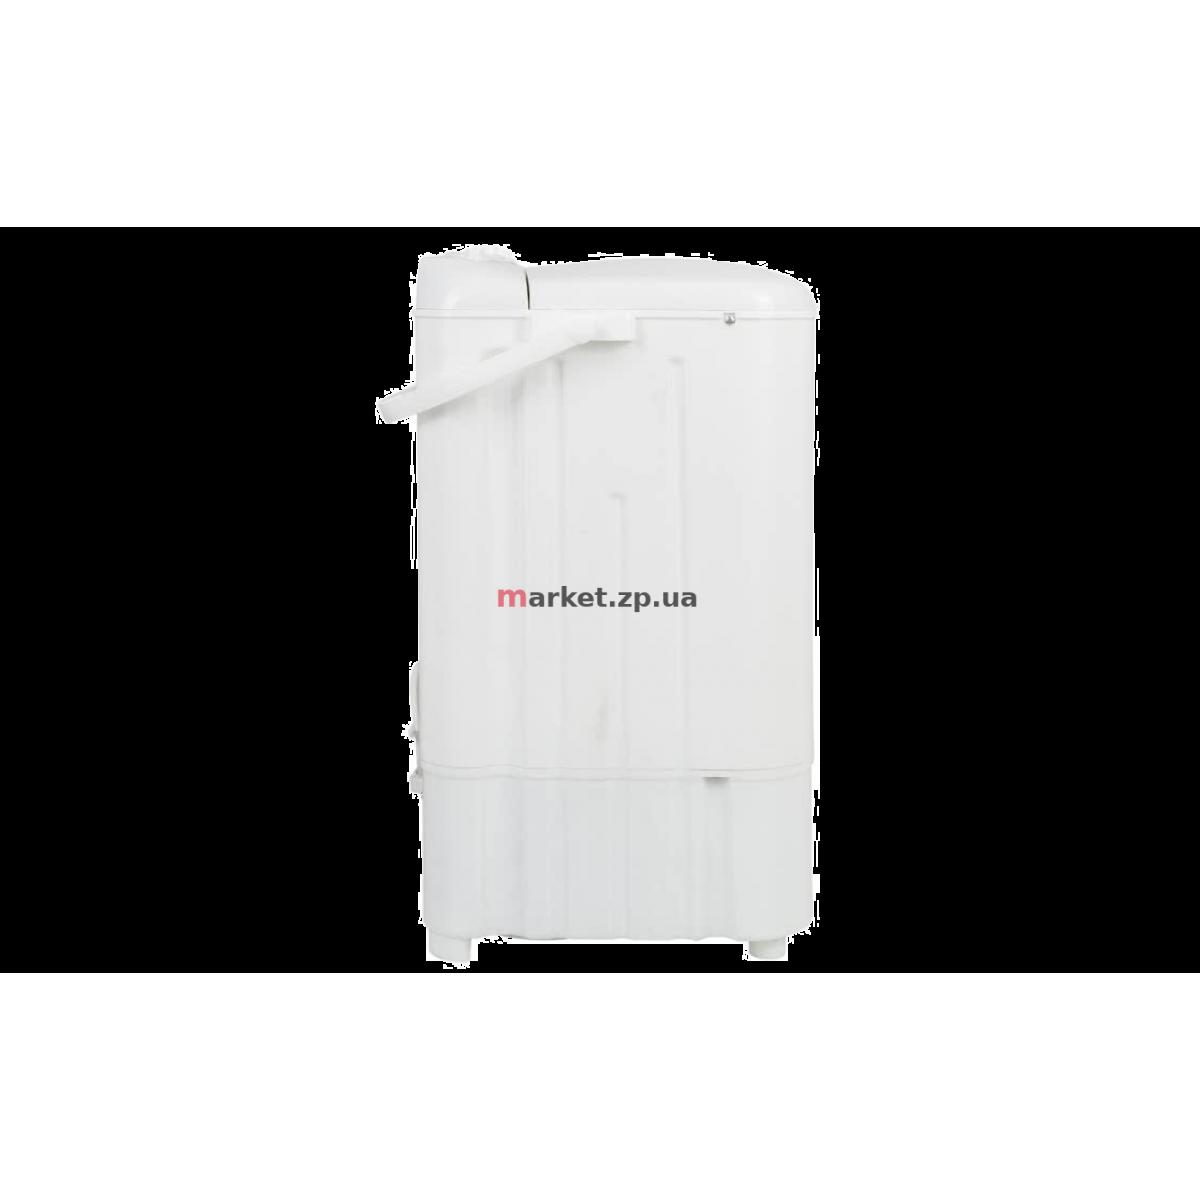 Стиральная машина полуавтомат однобаковая SATURN ST-WK1616